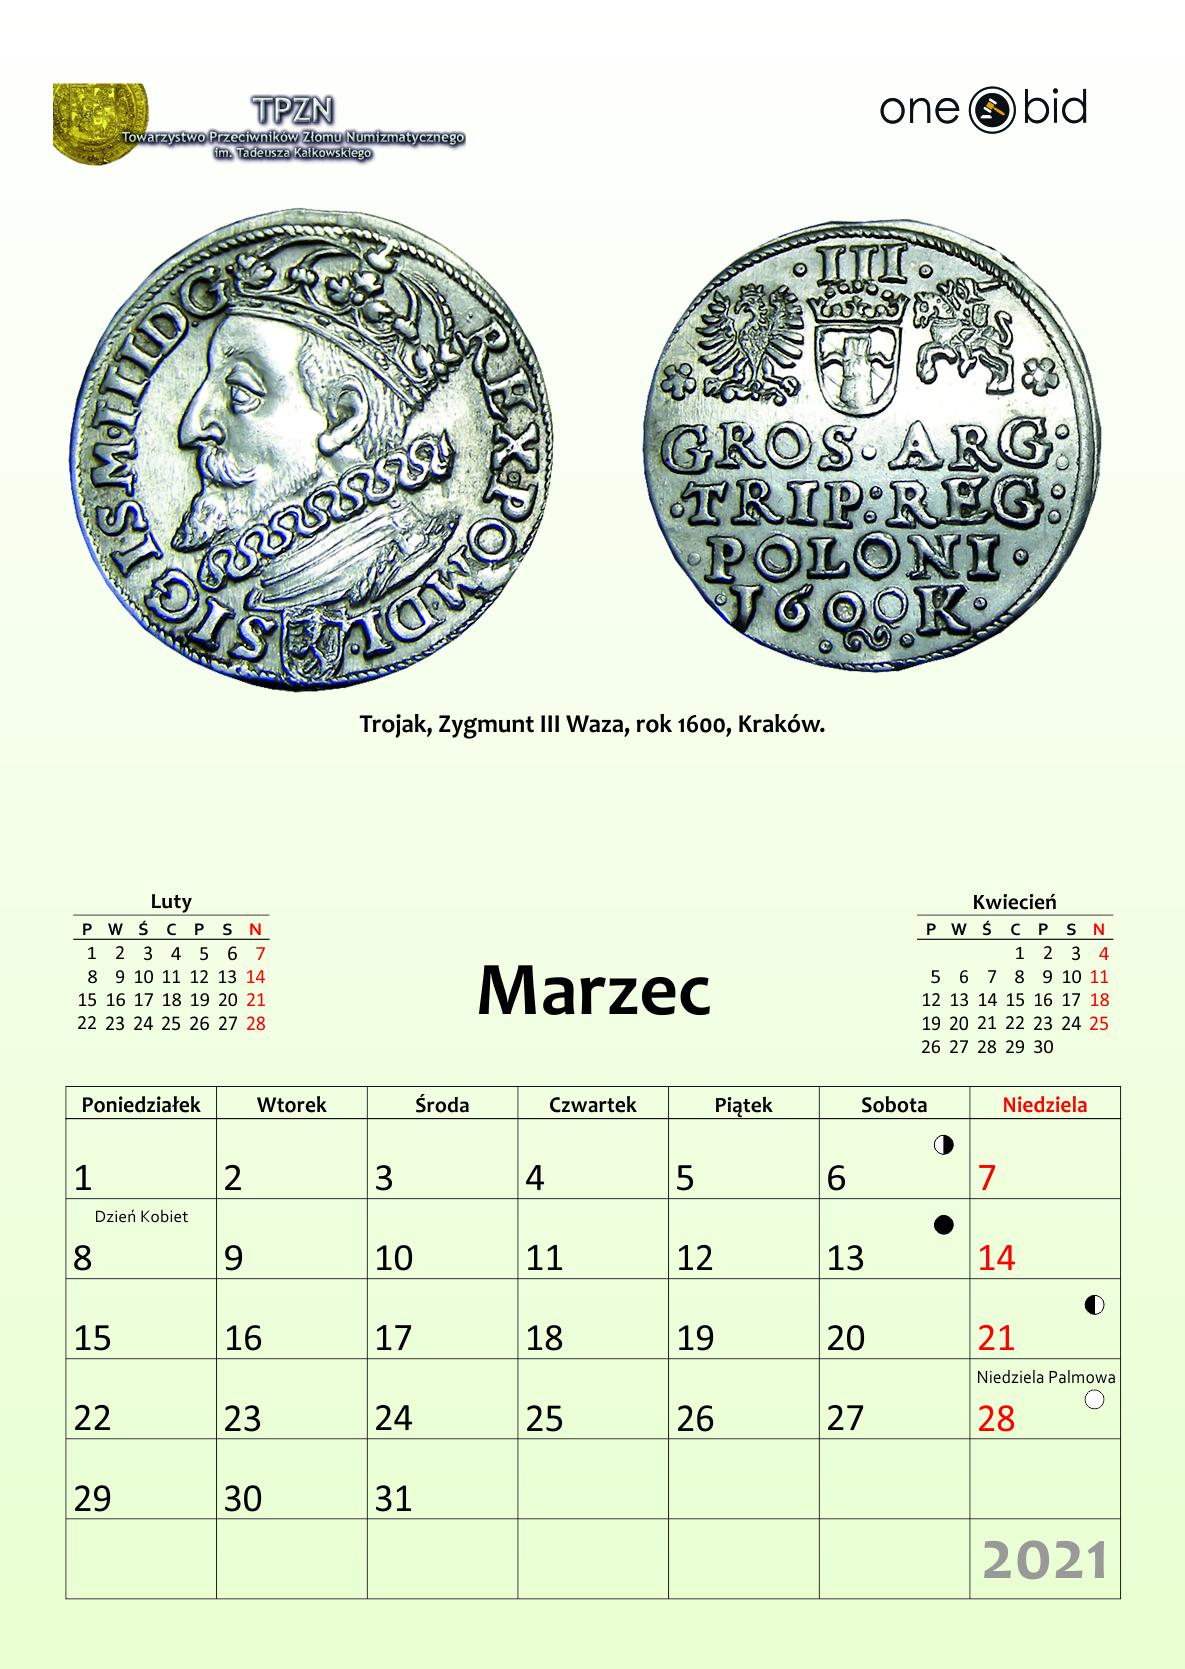 http://info.tpzn.pl/kalendarze/kalendarz2021/marzec2021.jpg